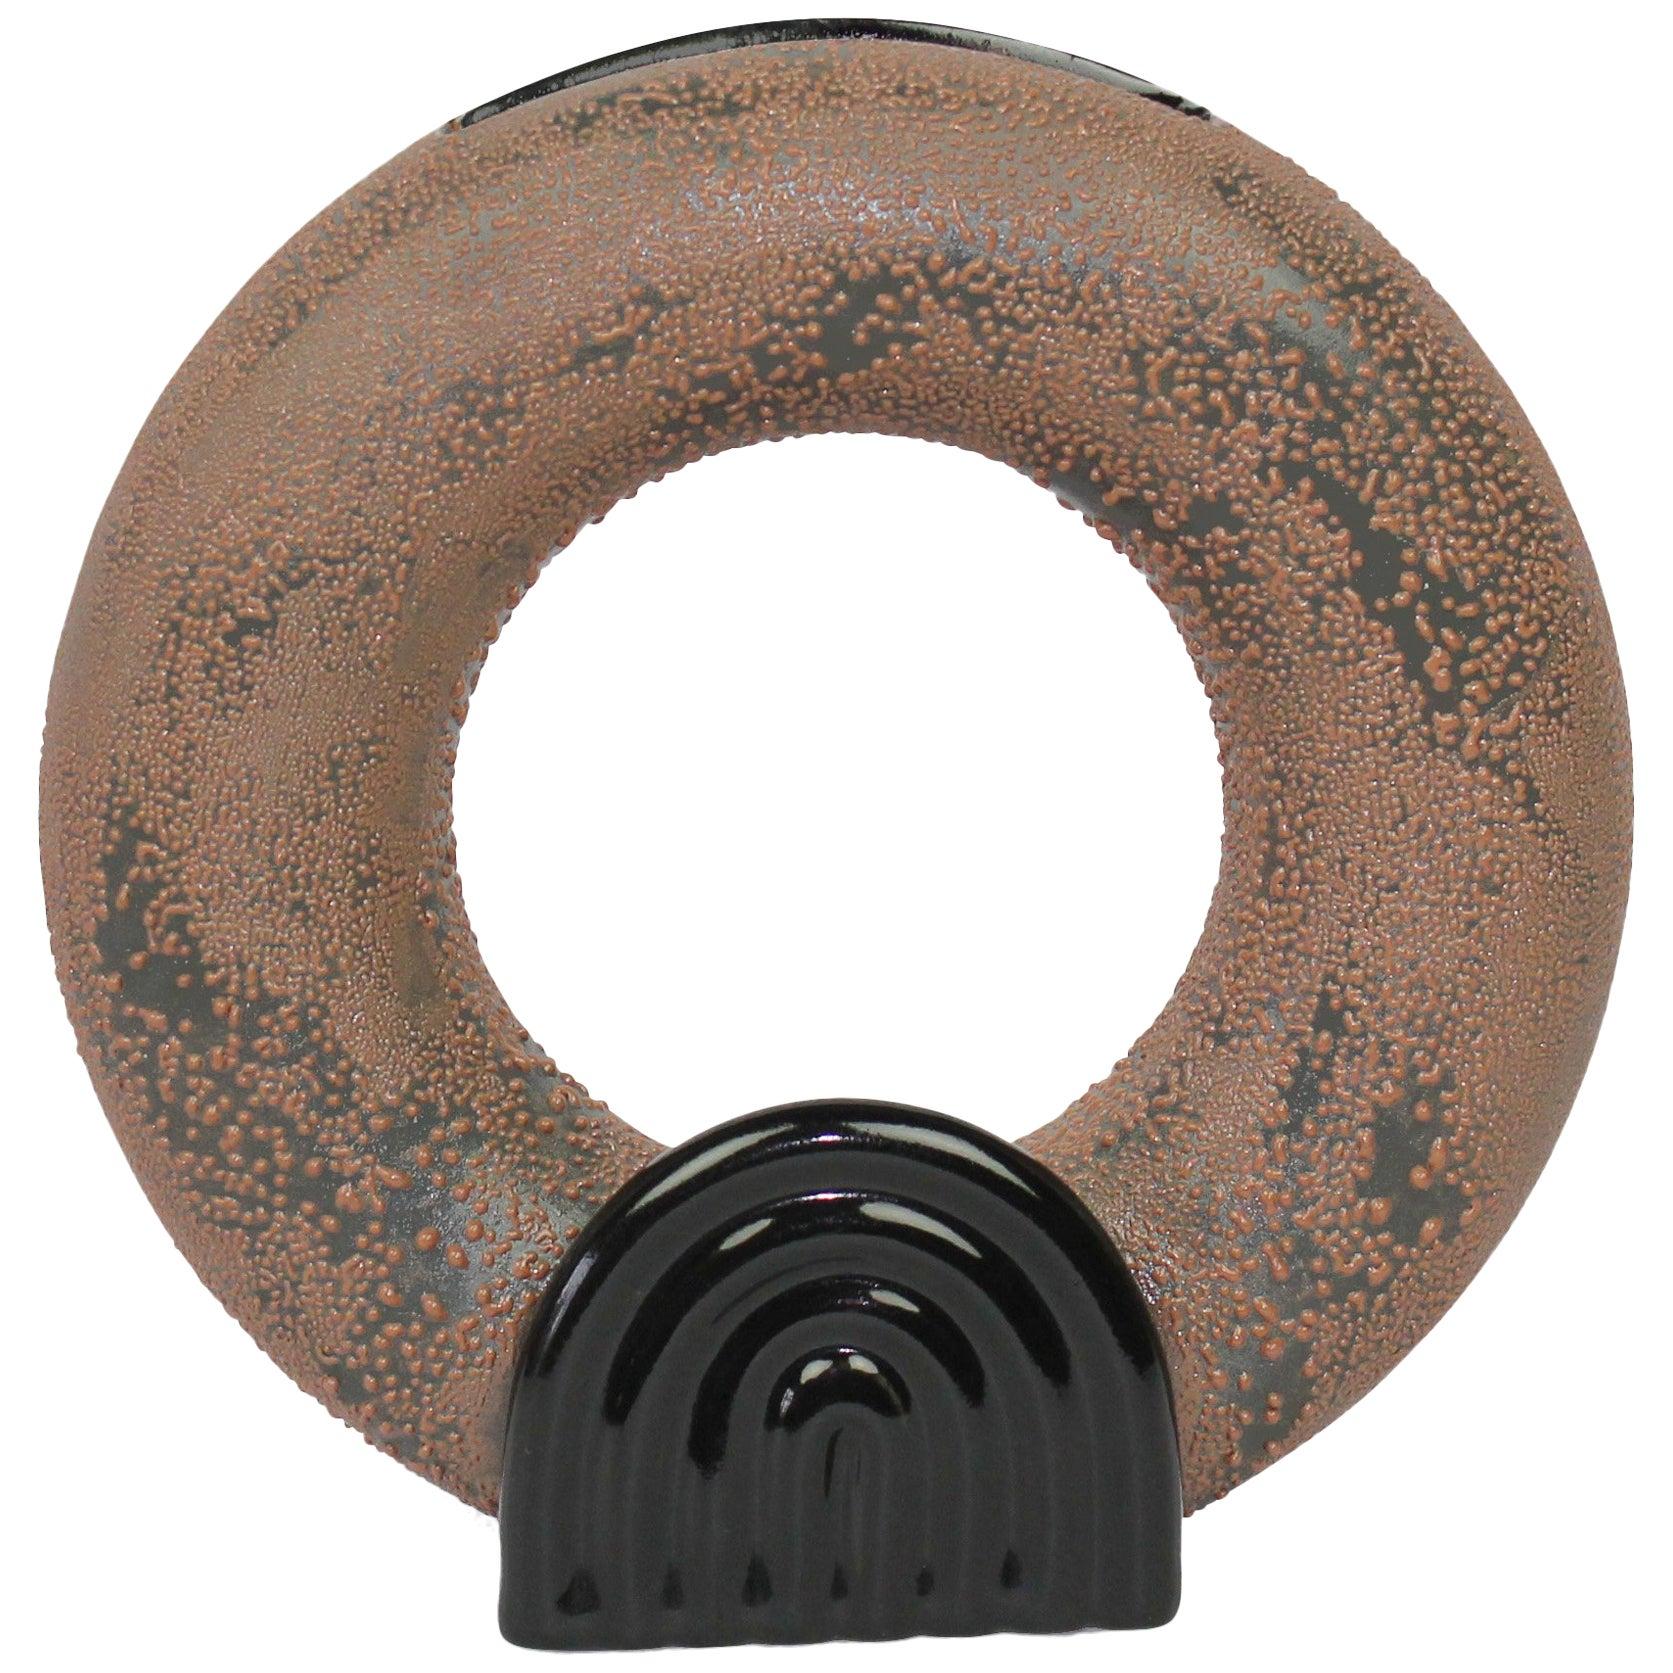 Contemporary Circular Brown Dew Vase Vessel Ikebana Ceramic and Glaze, Handmade